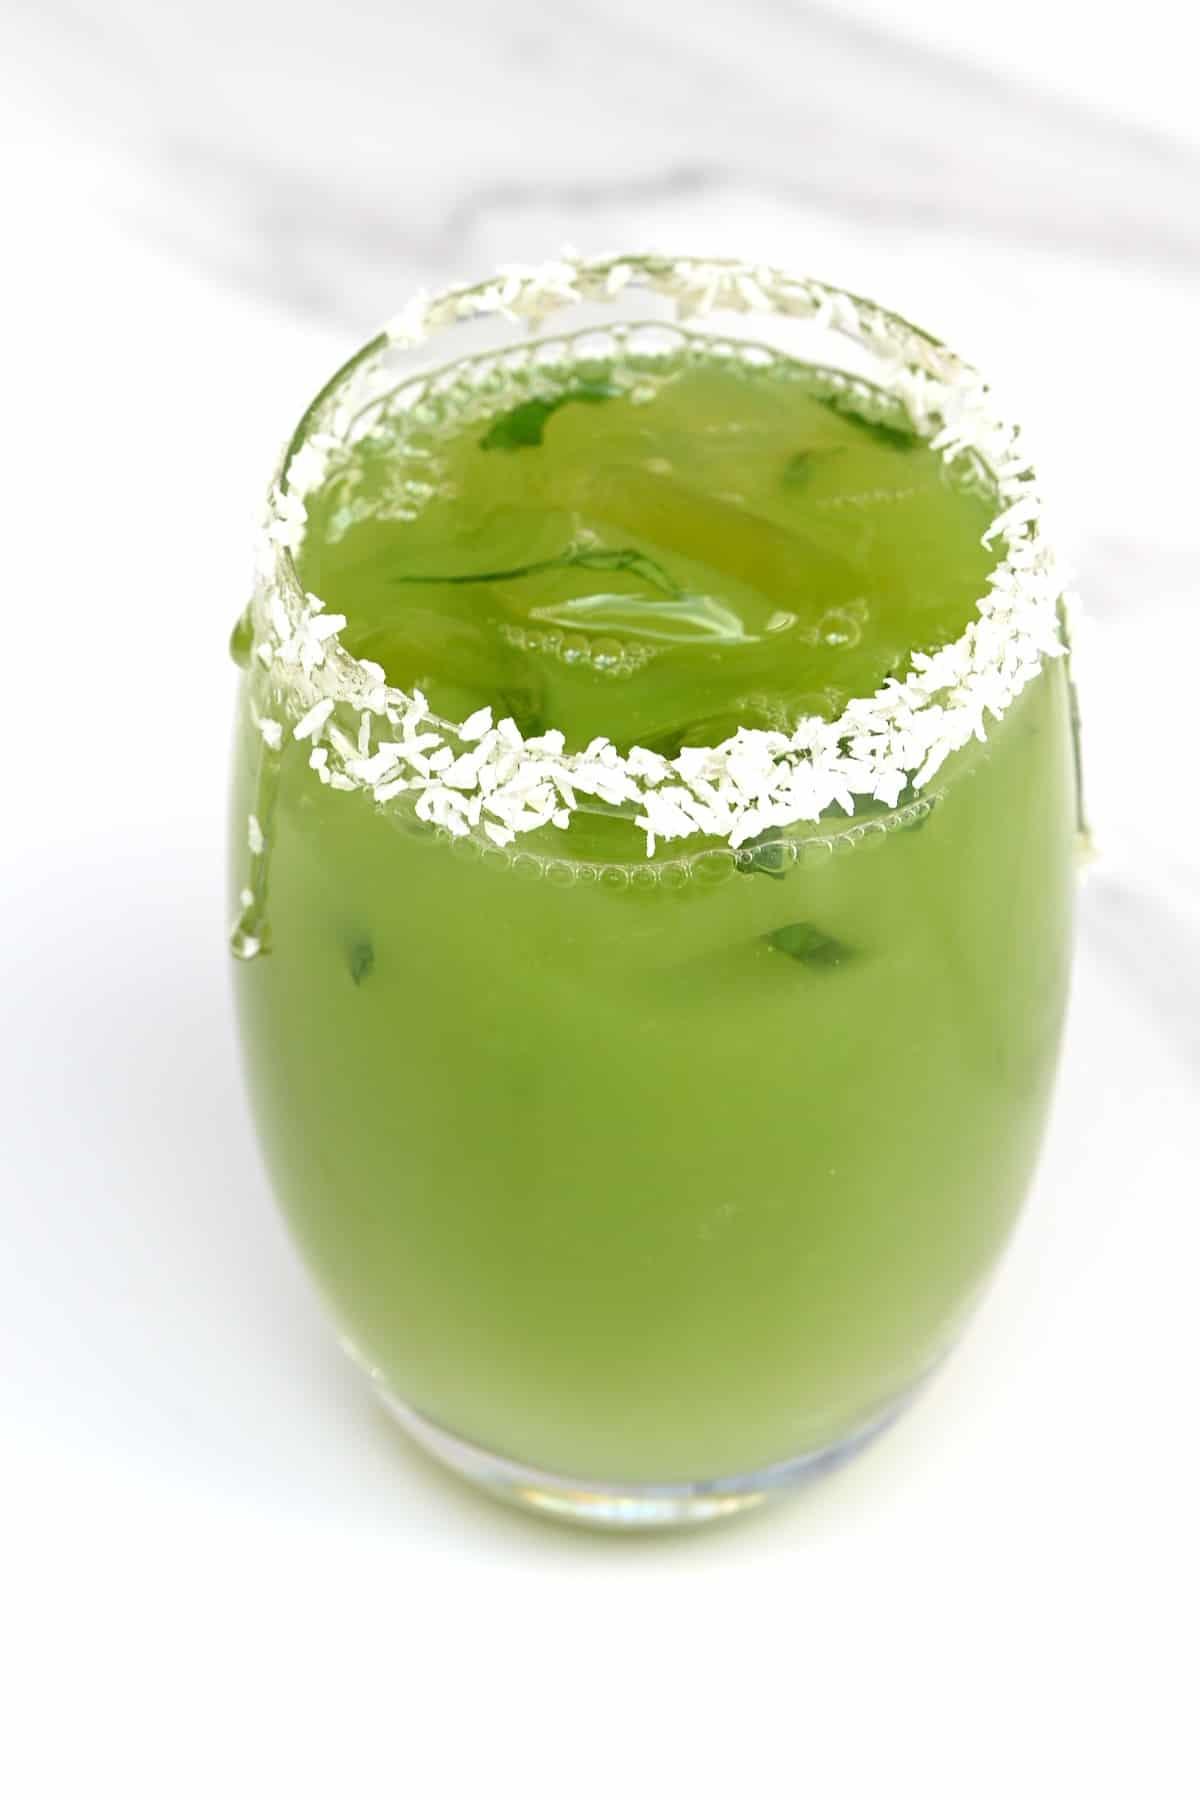 A glass with cucumber lemonade